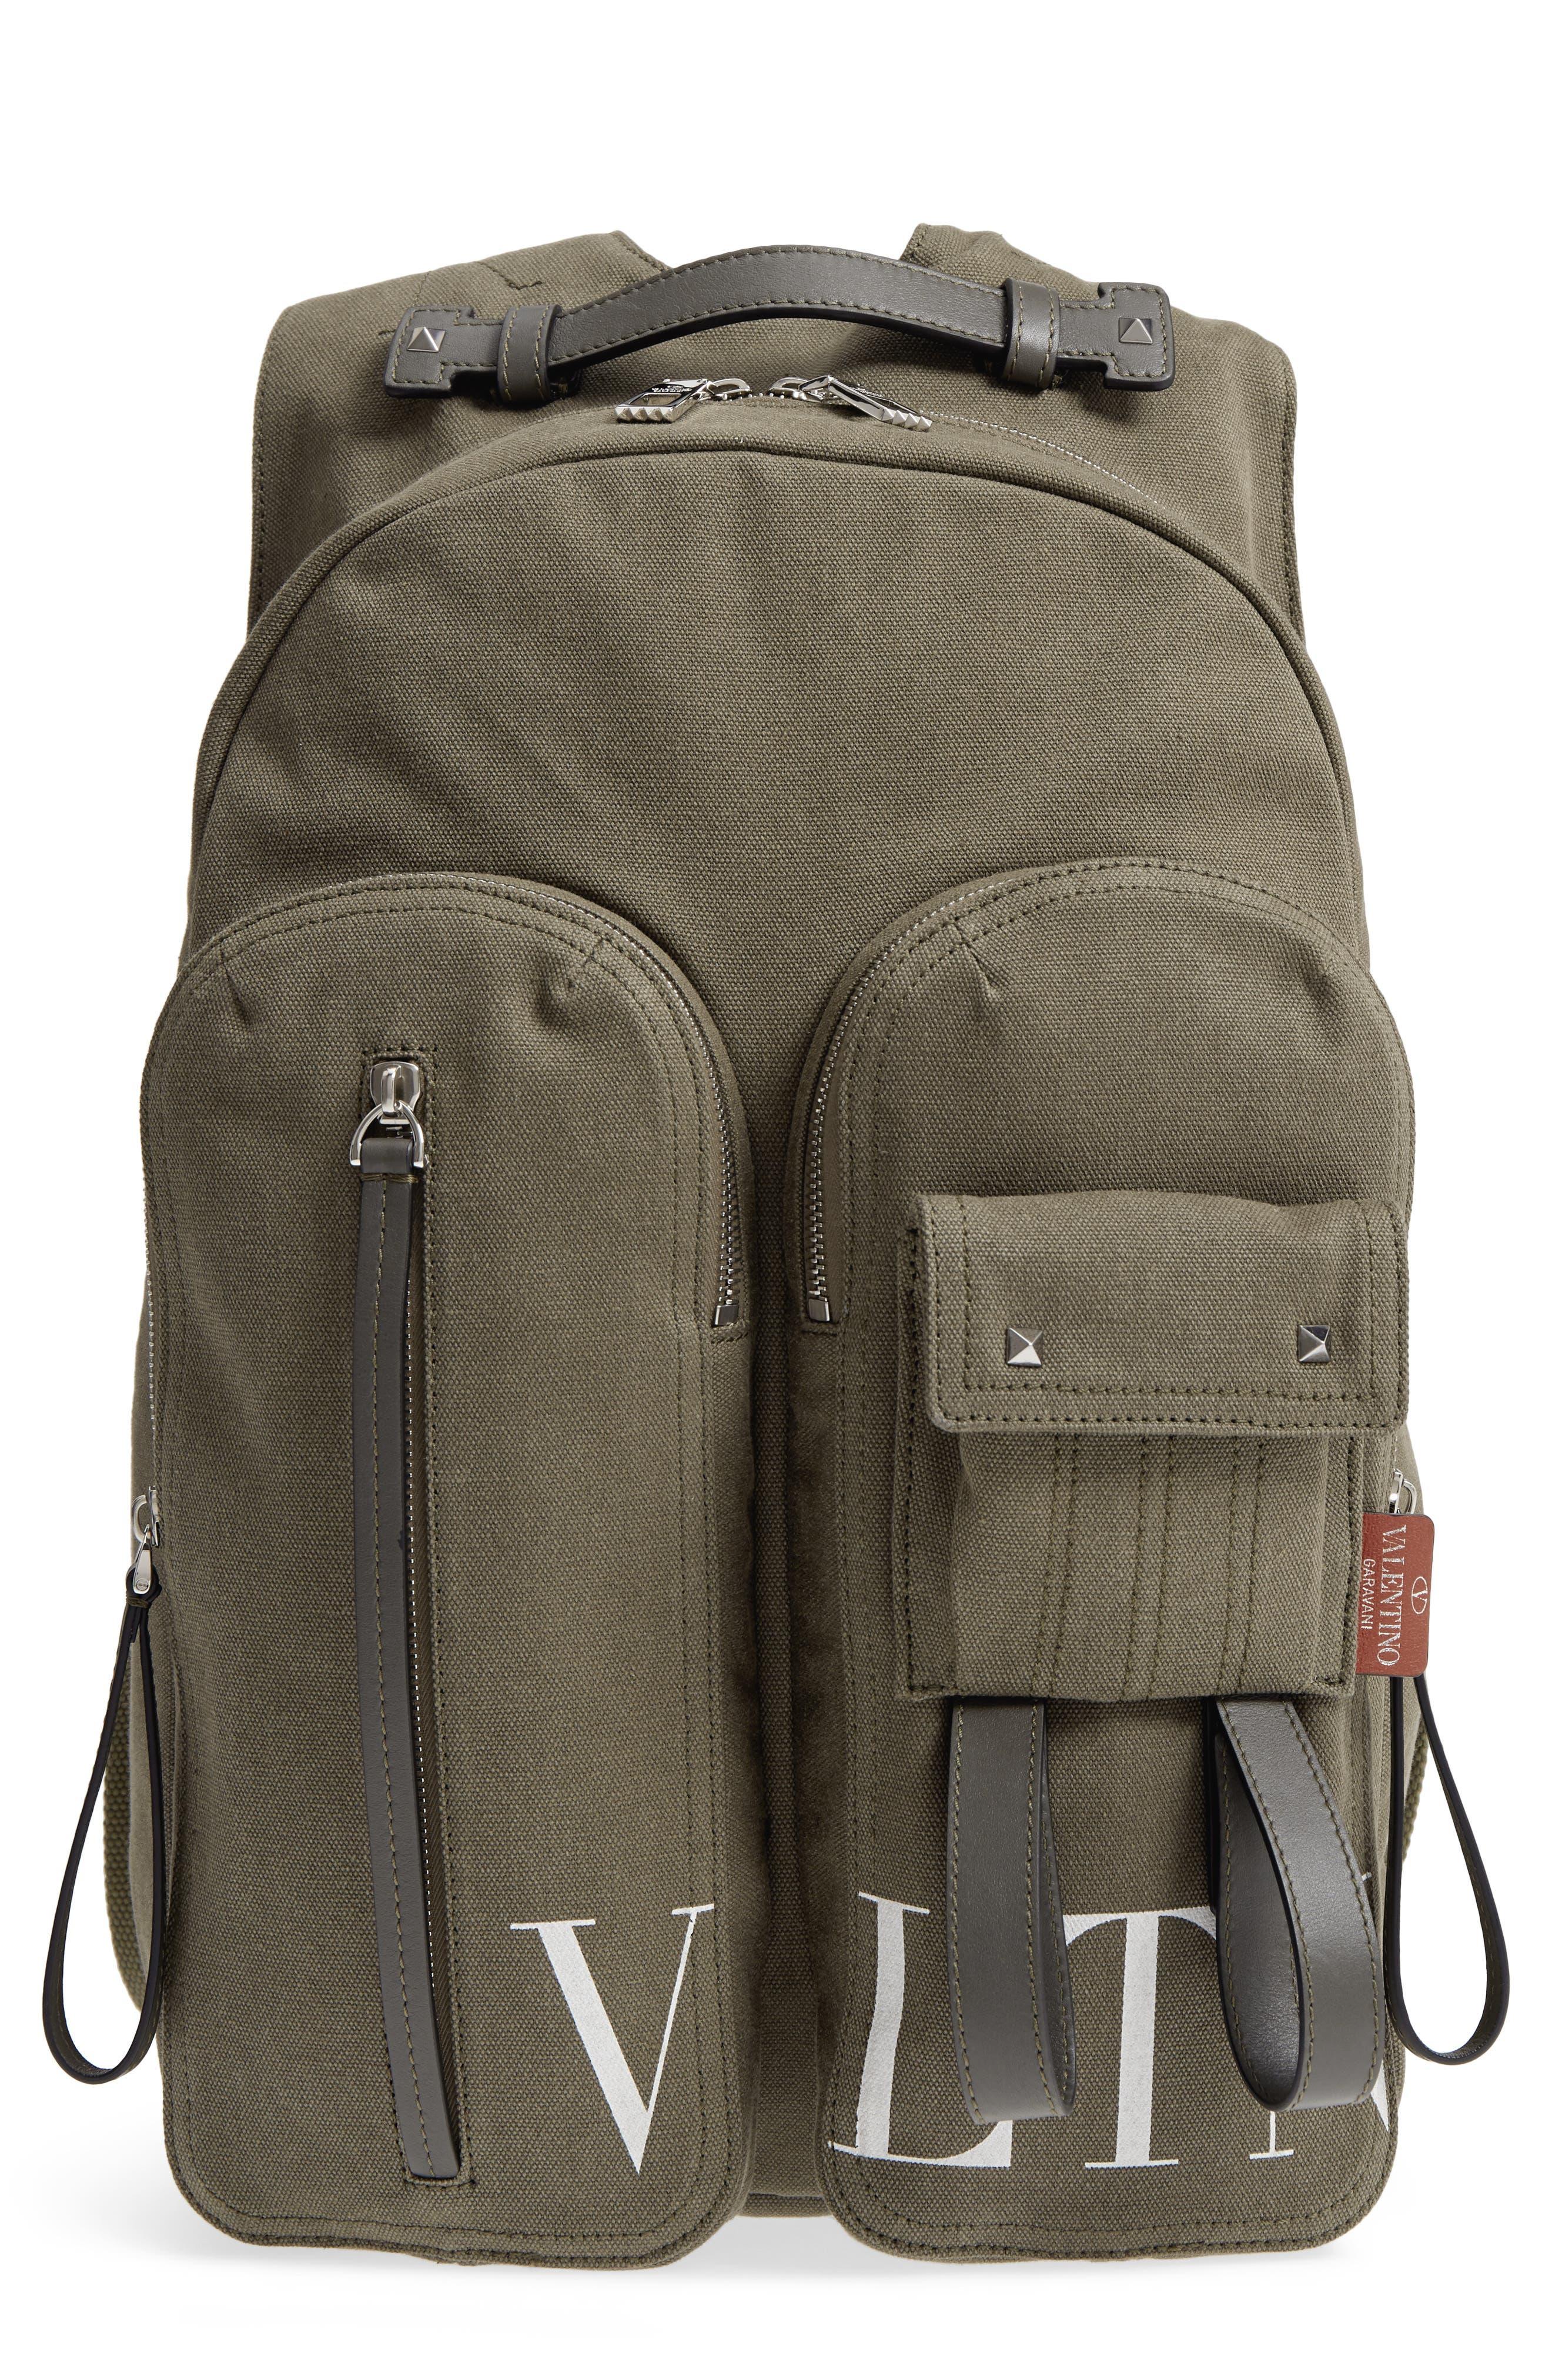 GARAVANI Canvas Military Backpack,                         Main,                         color, L90 Olive